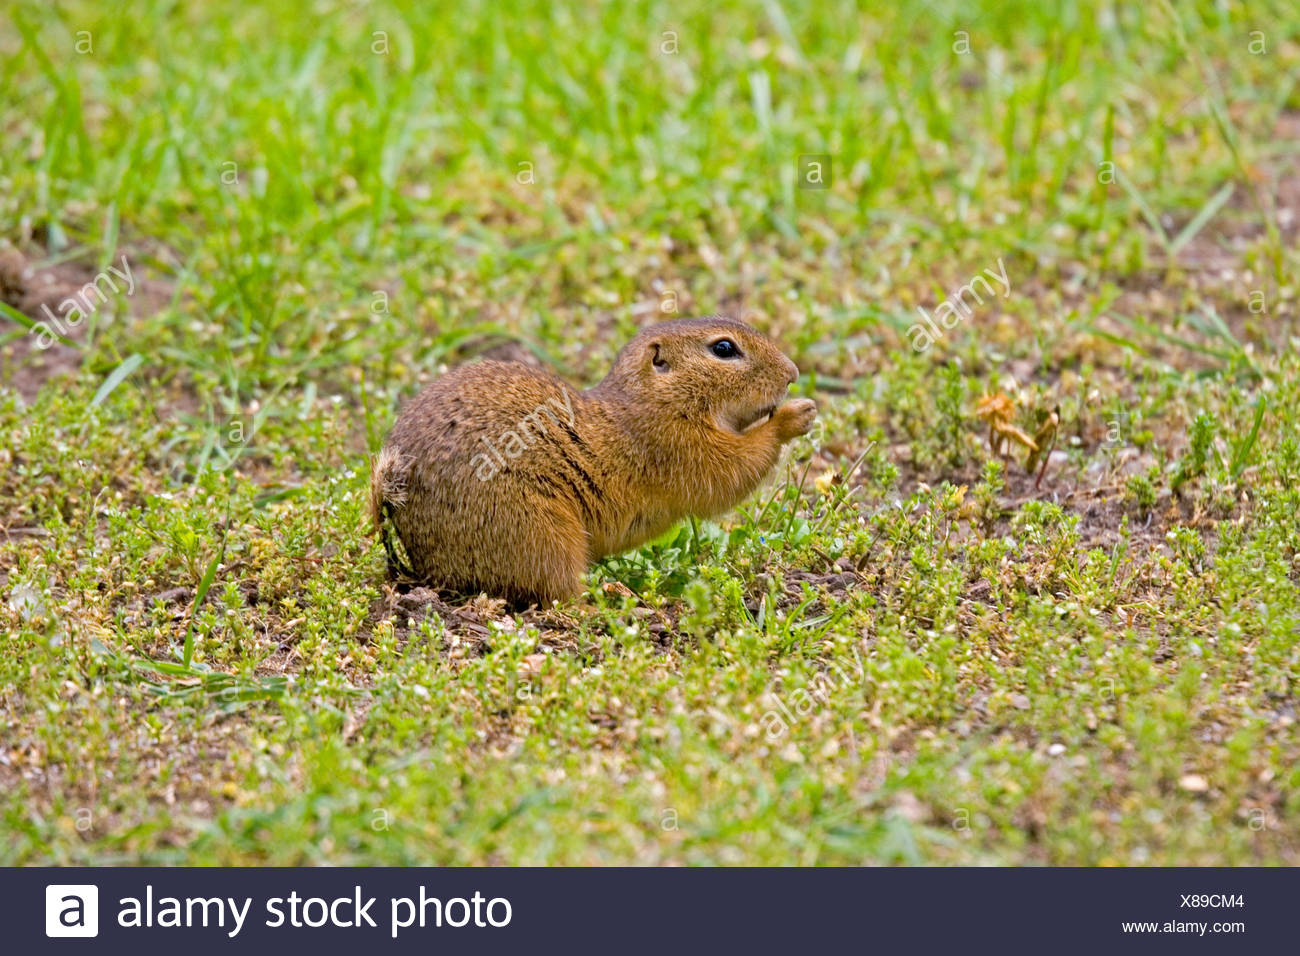 European ground squirrel, European suslik, European souslik (Citellus citellus, Spermophilus citellus), on the feed, Germany Stock Photo